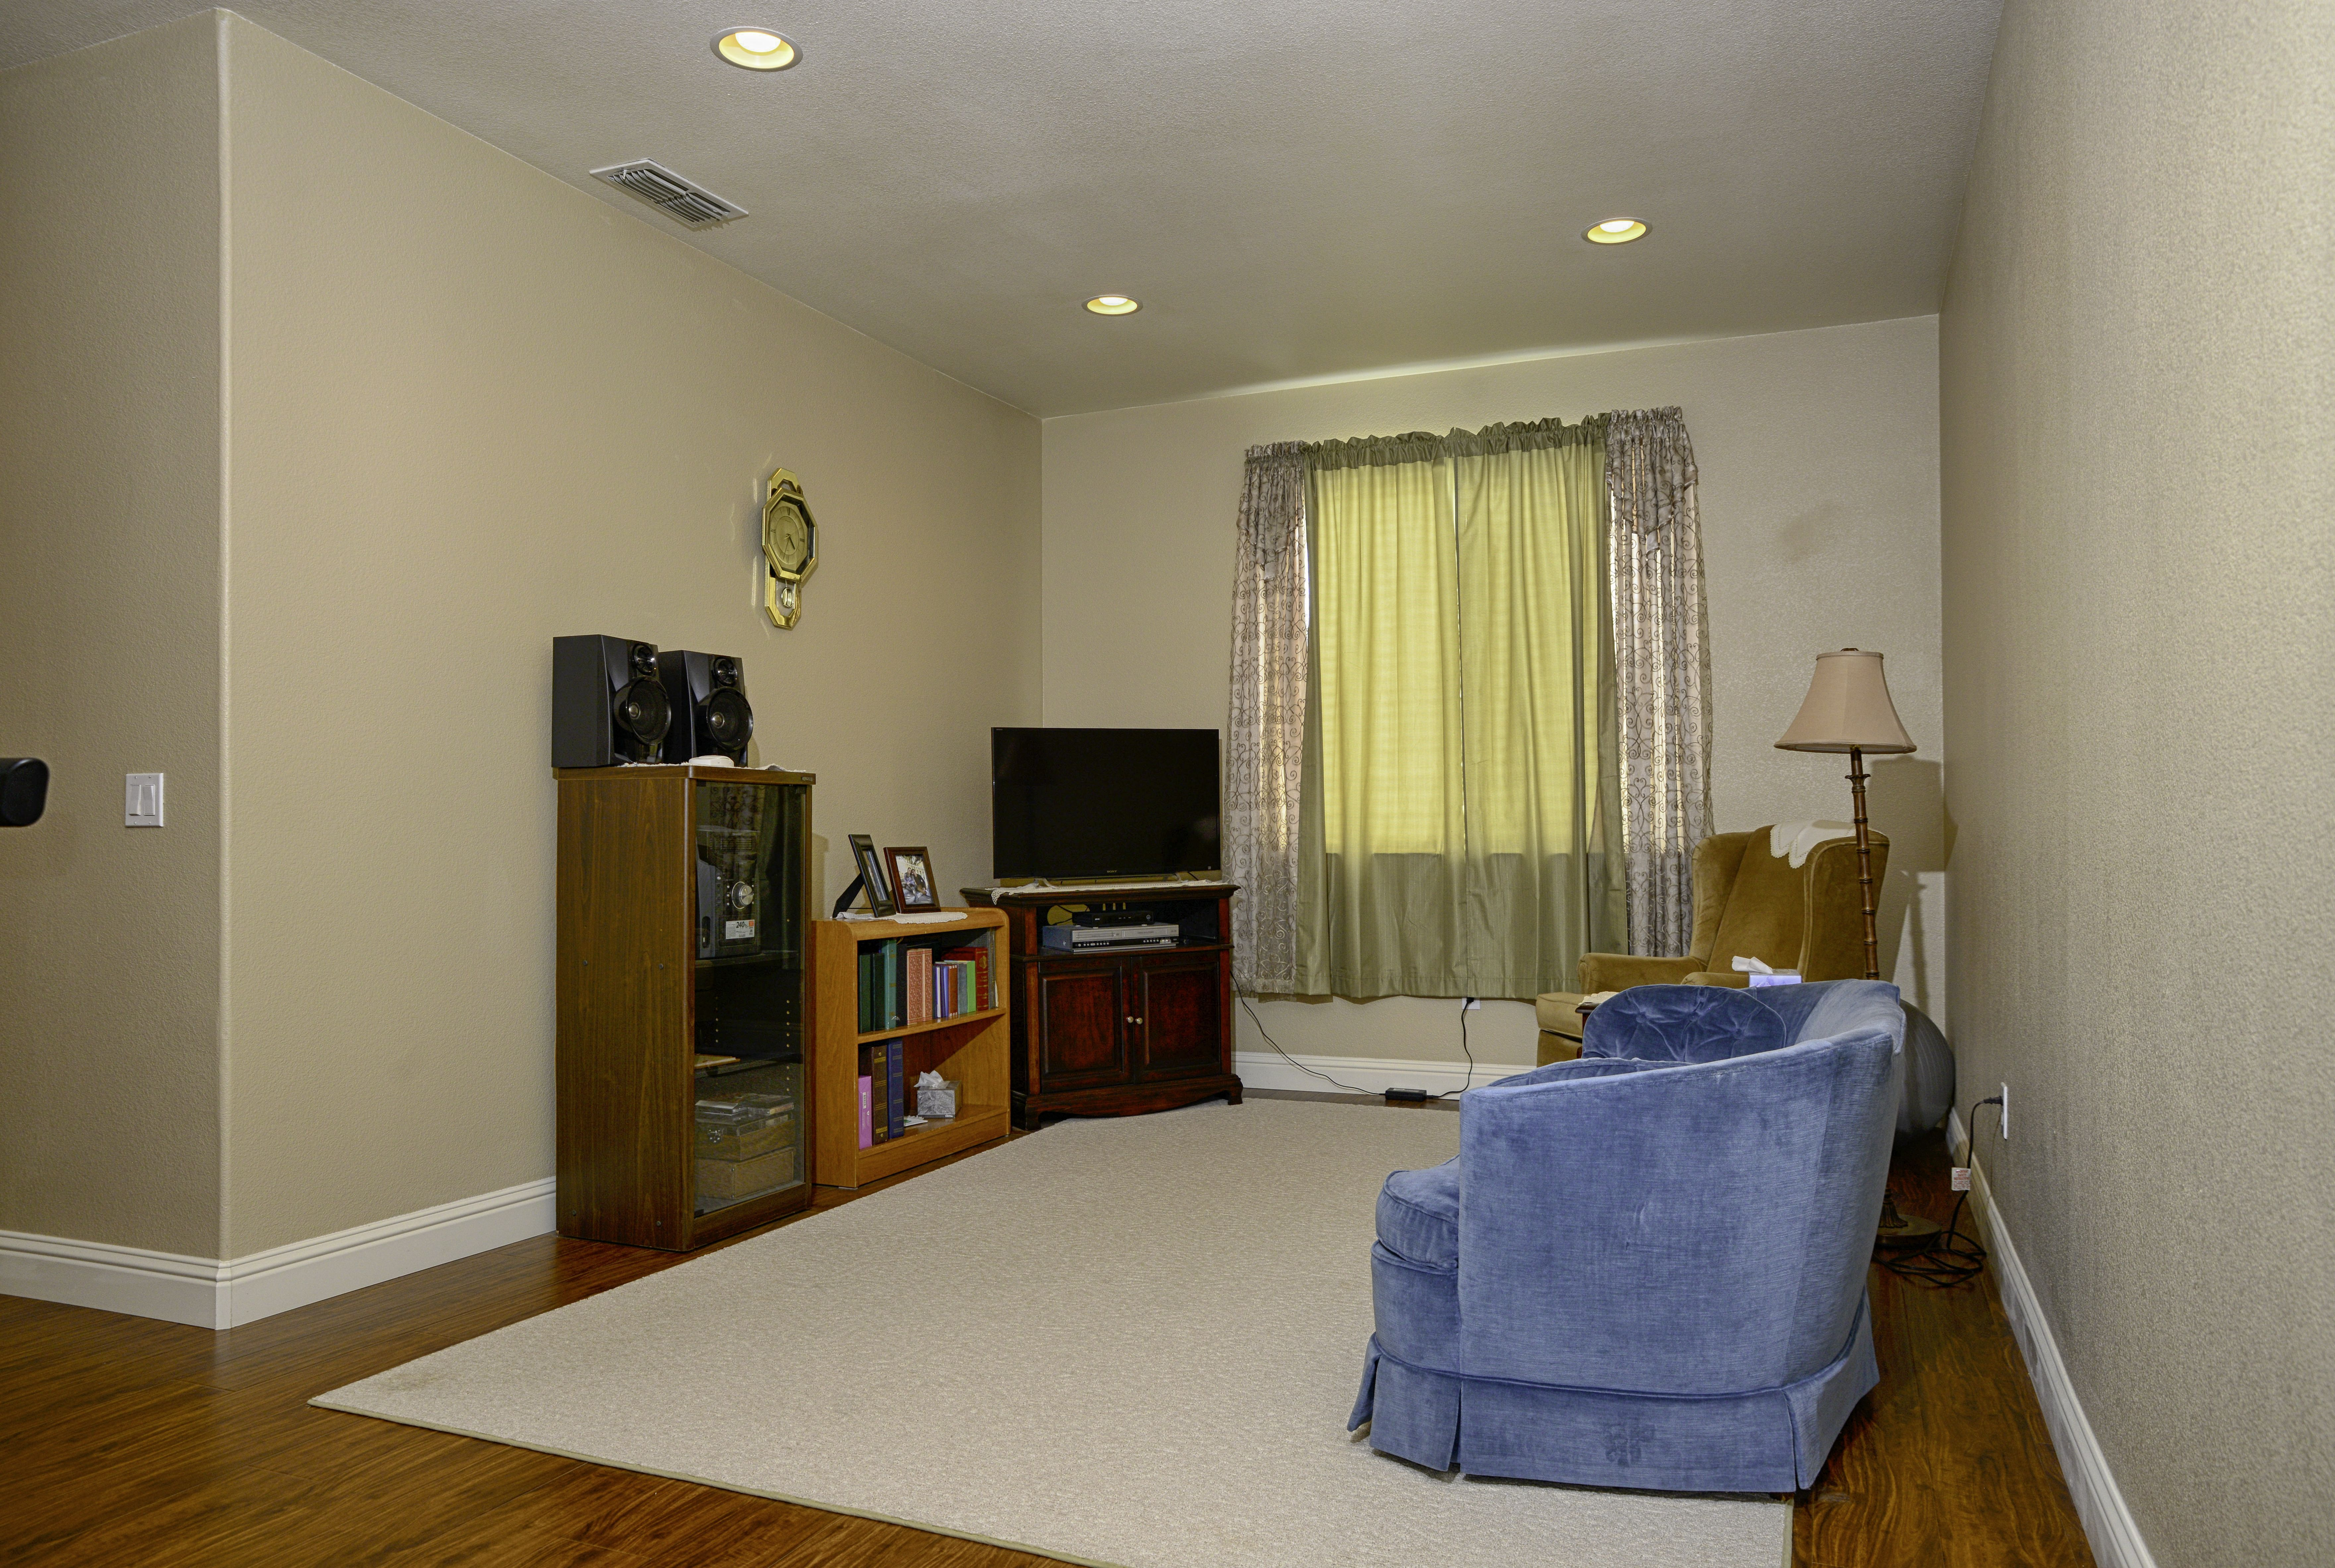 Buy El 20043 Bathroom Ceiling Light: 9400 Roan Ranch Cir. Elk Grove 5 Bedroom Home For Sale